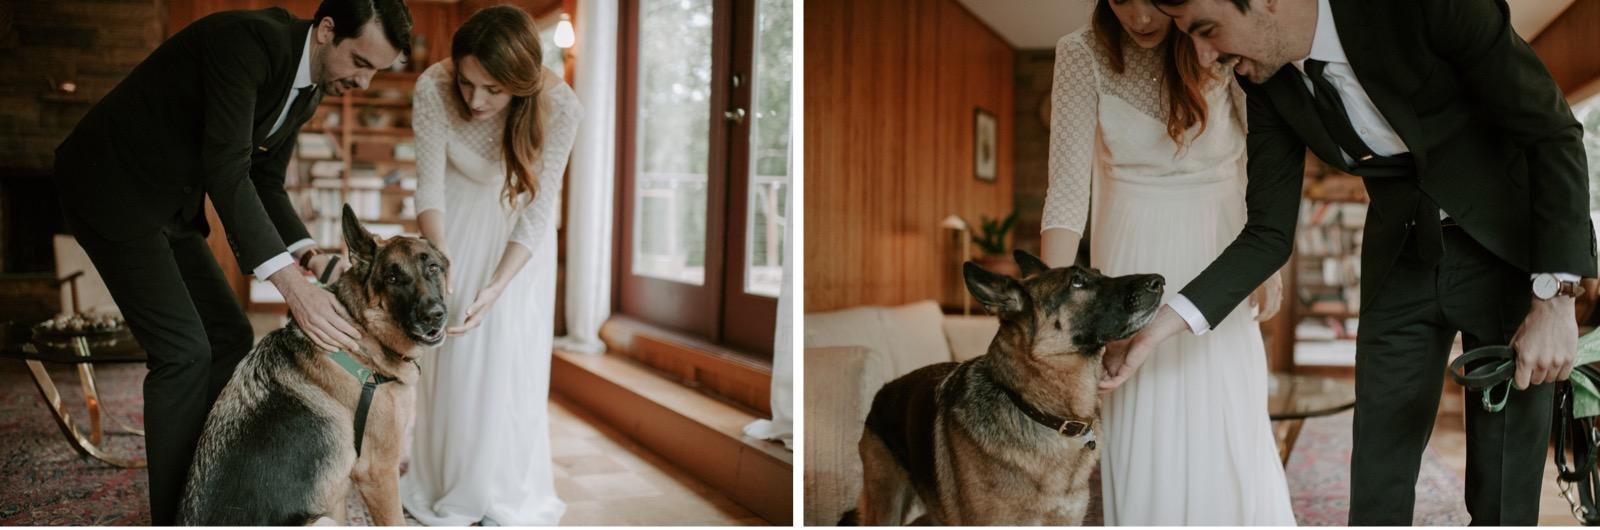 Corson_Building_Wedding_034.JPG